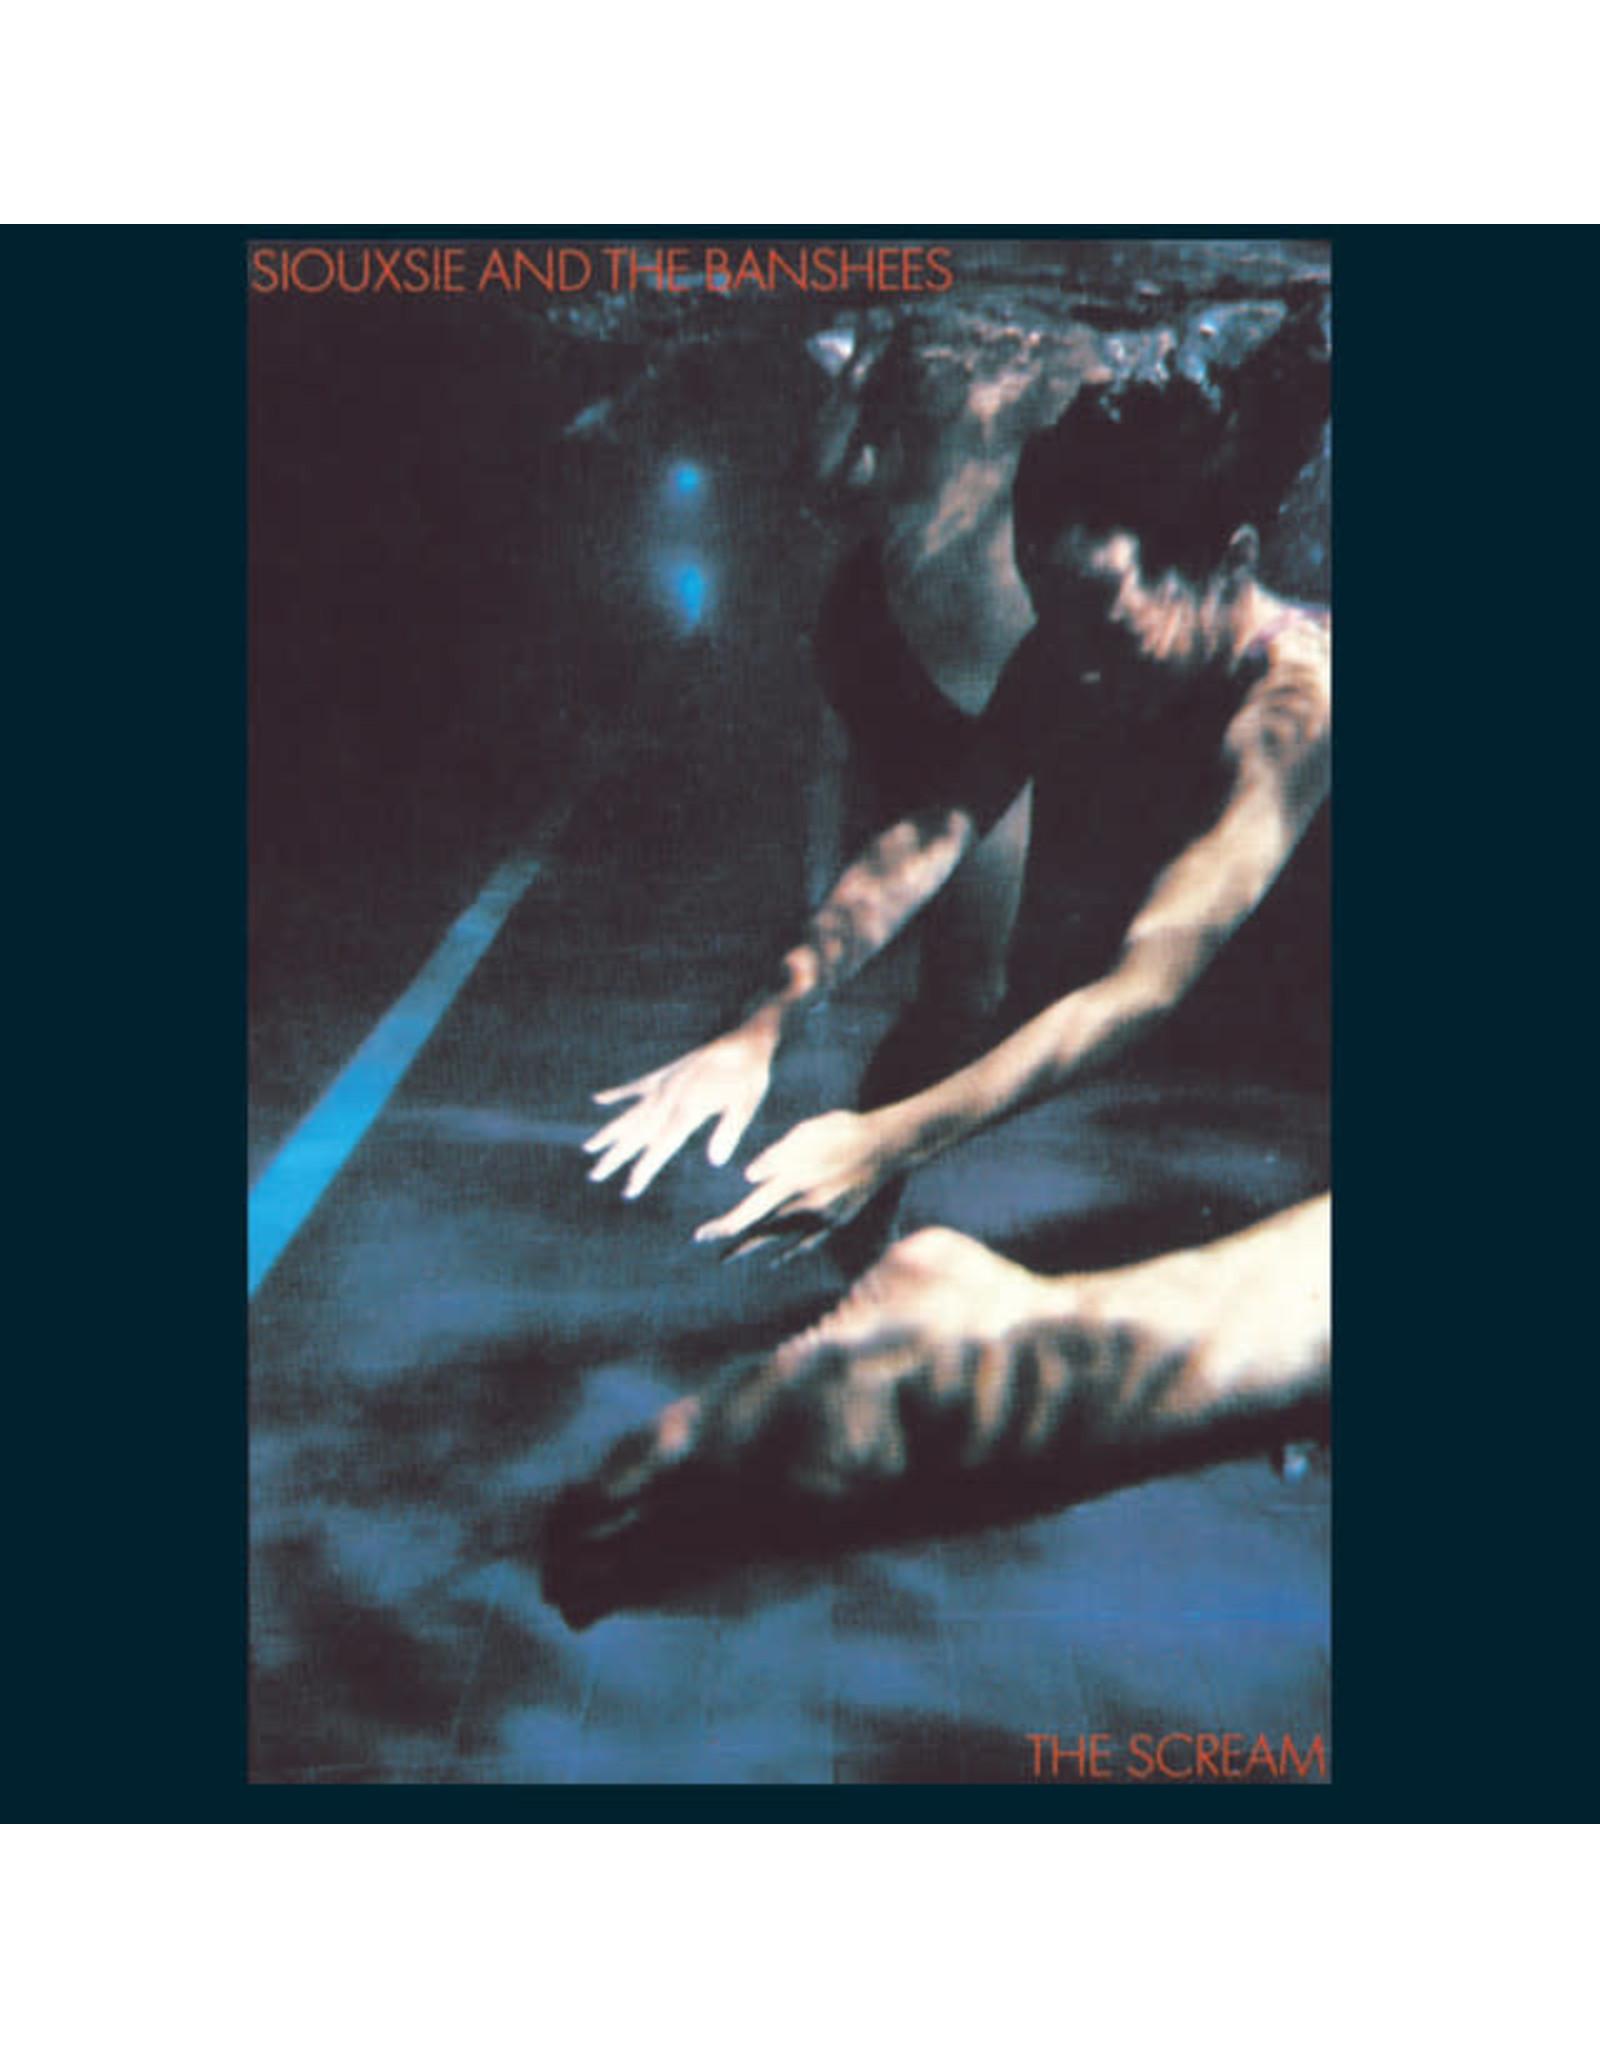 Vinyl Siouxsie & The Banshees - The Scream